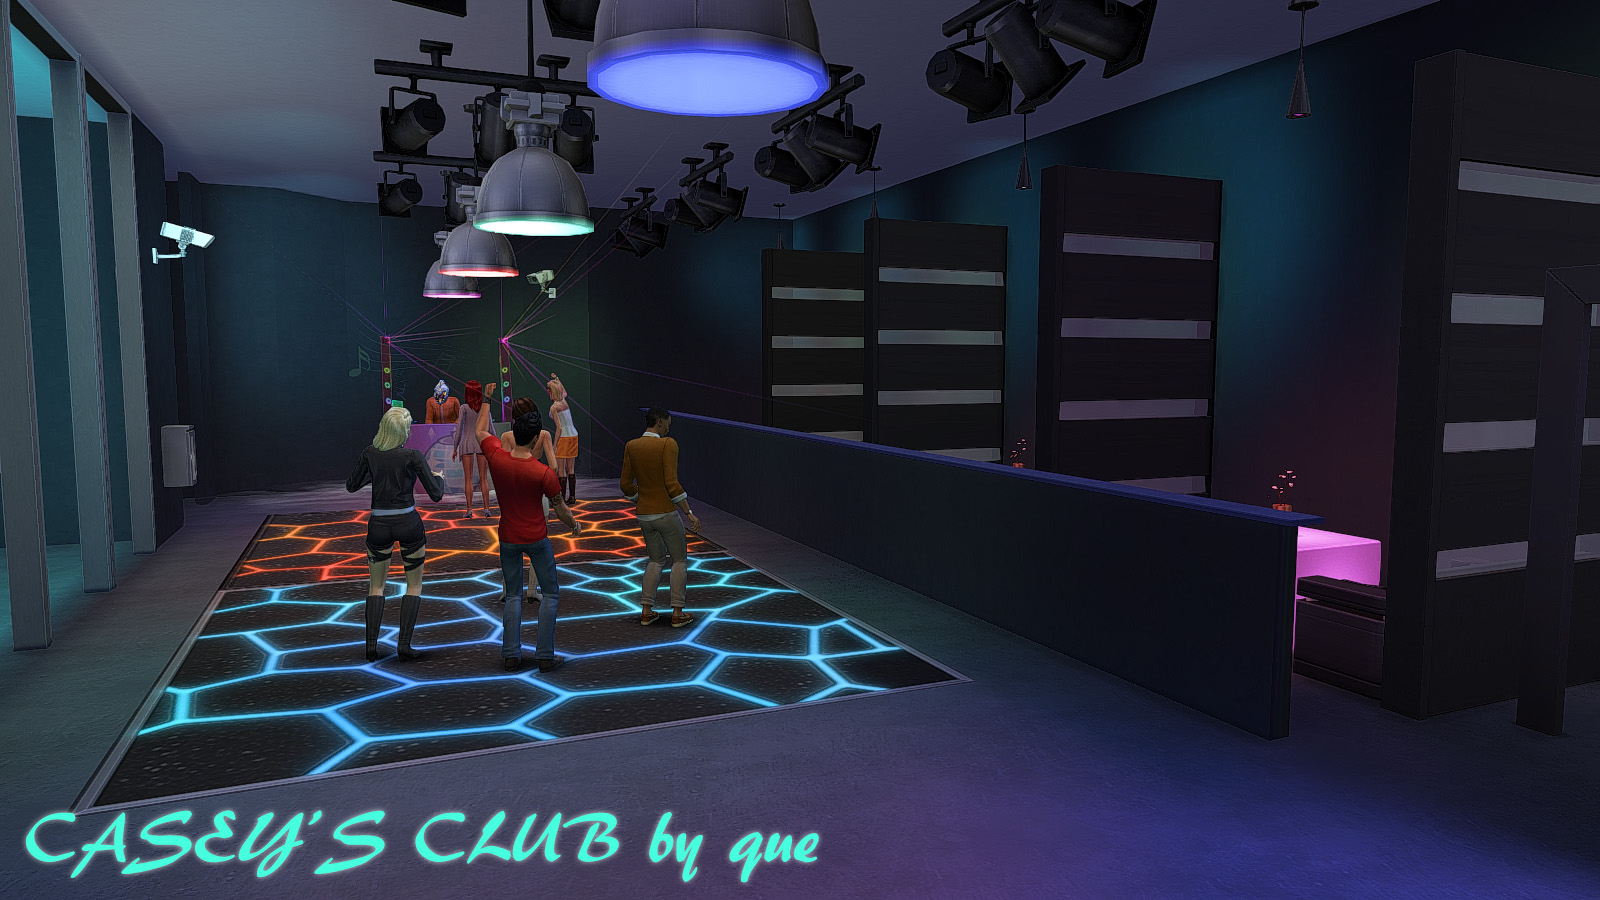 симс 4 ночной клуб мод